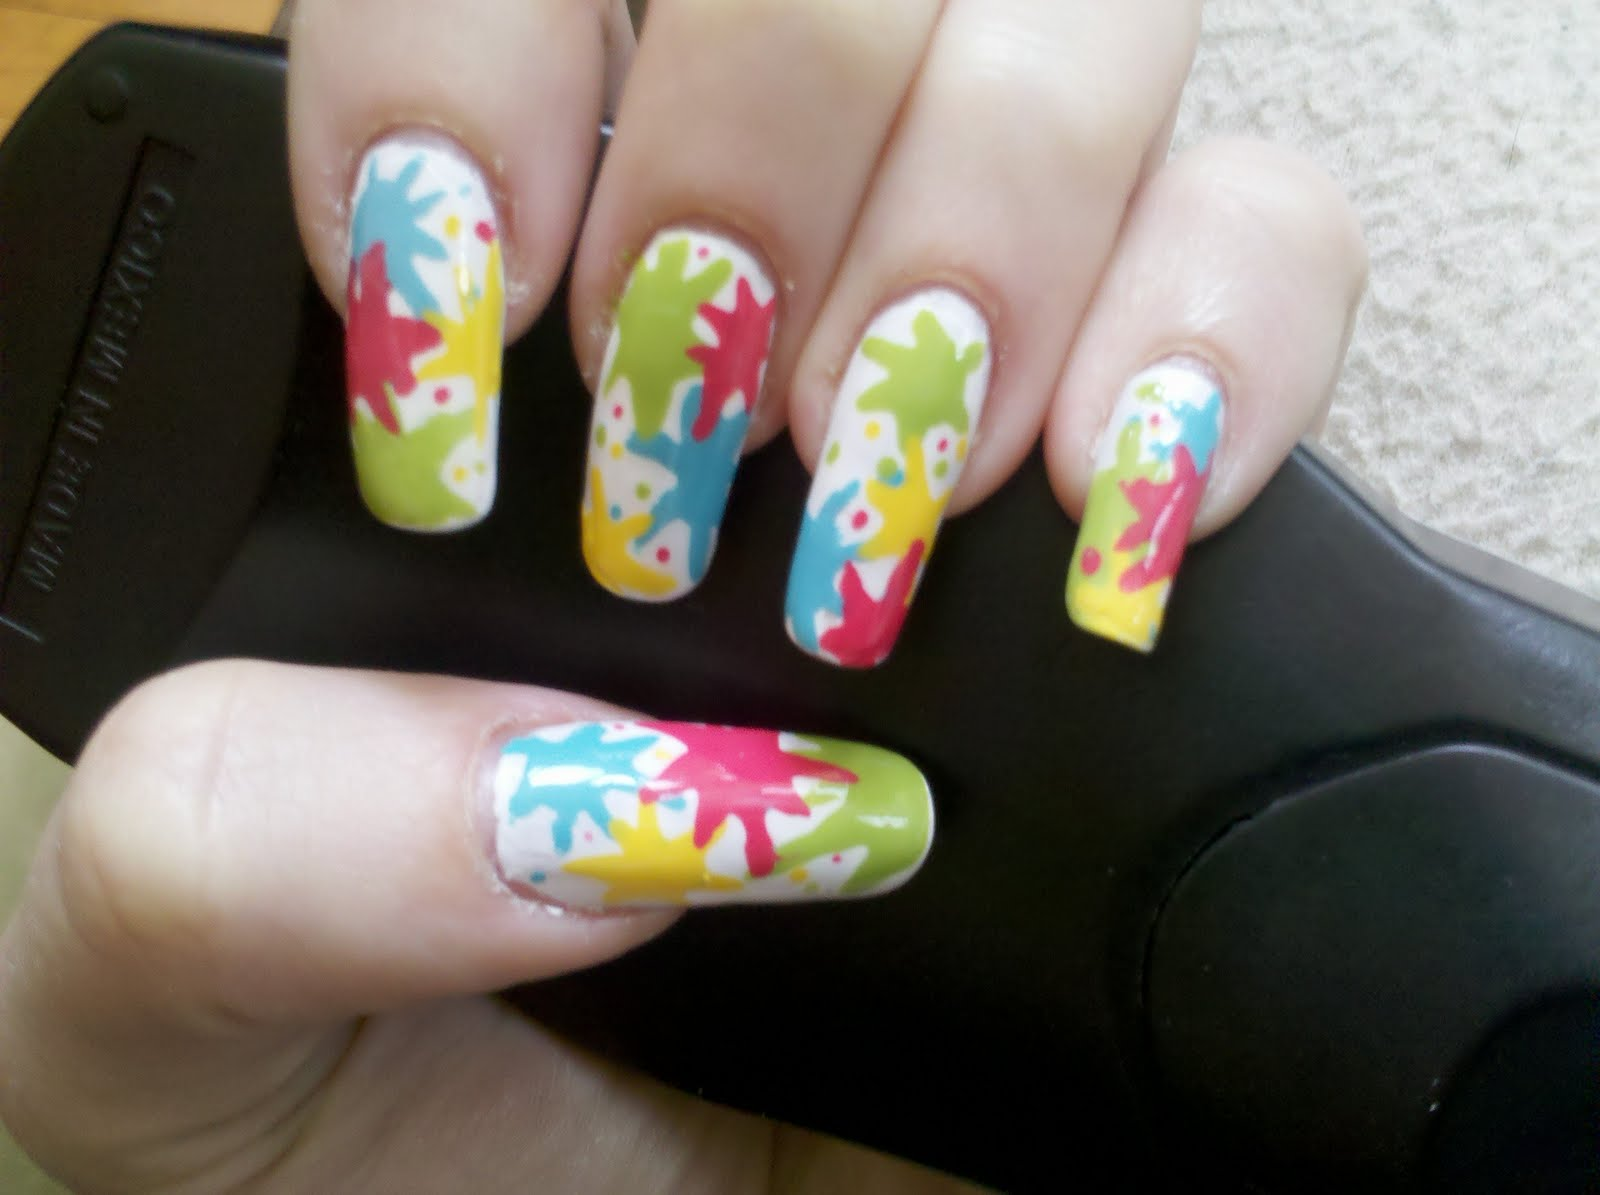 Kateng: Nail Art: Paint Splatter!